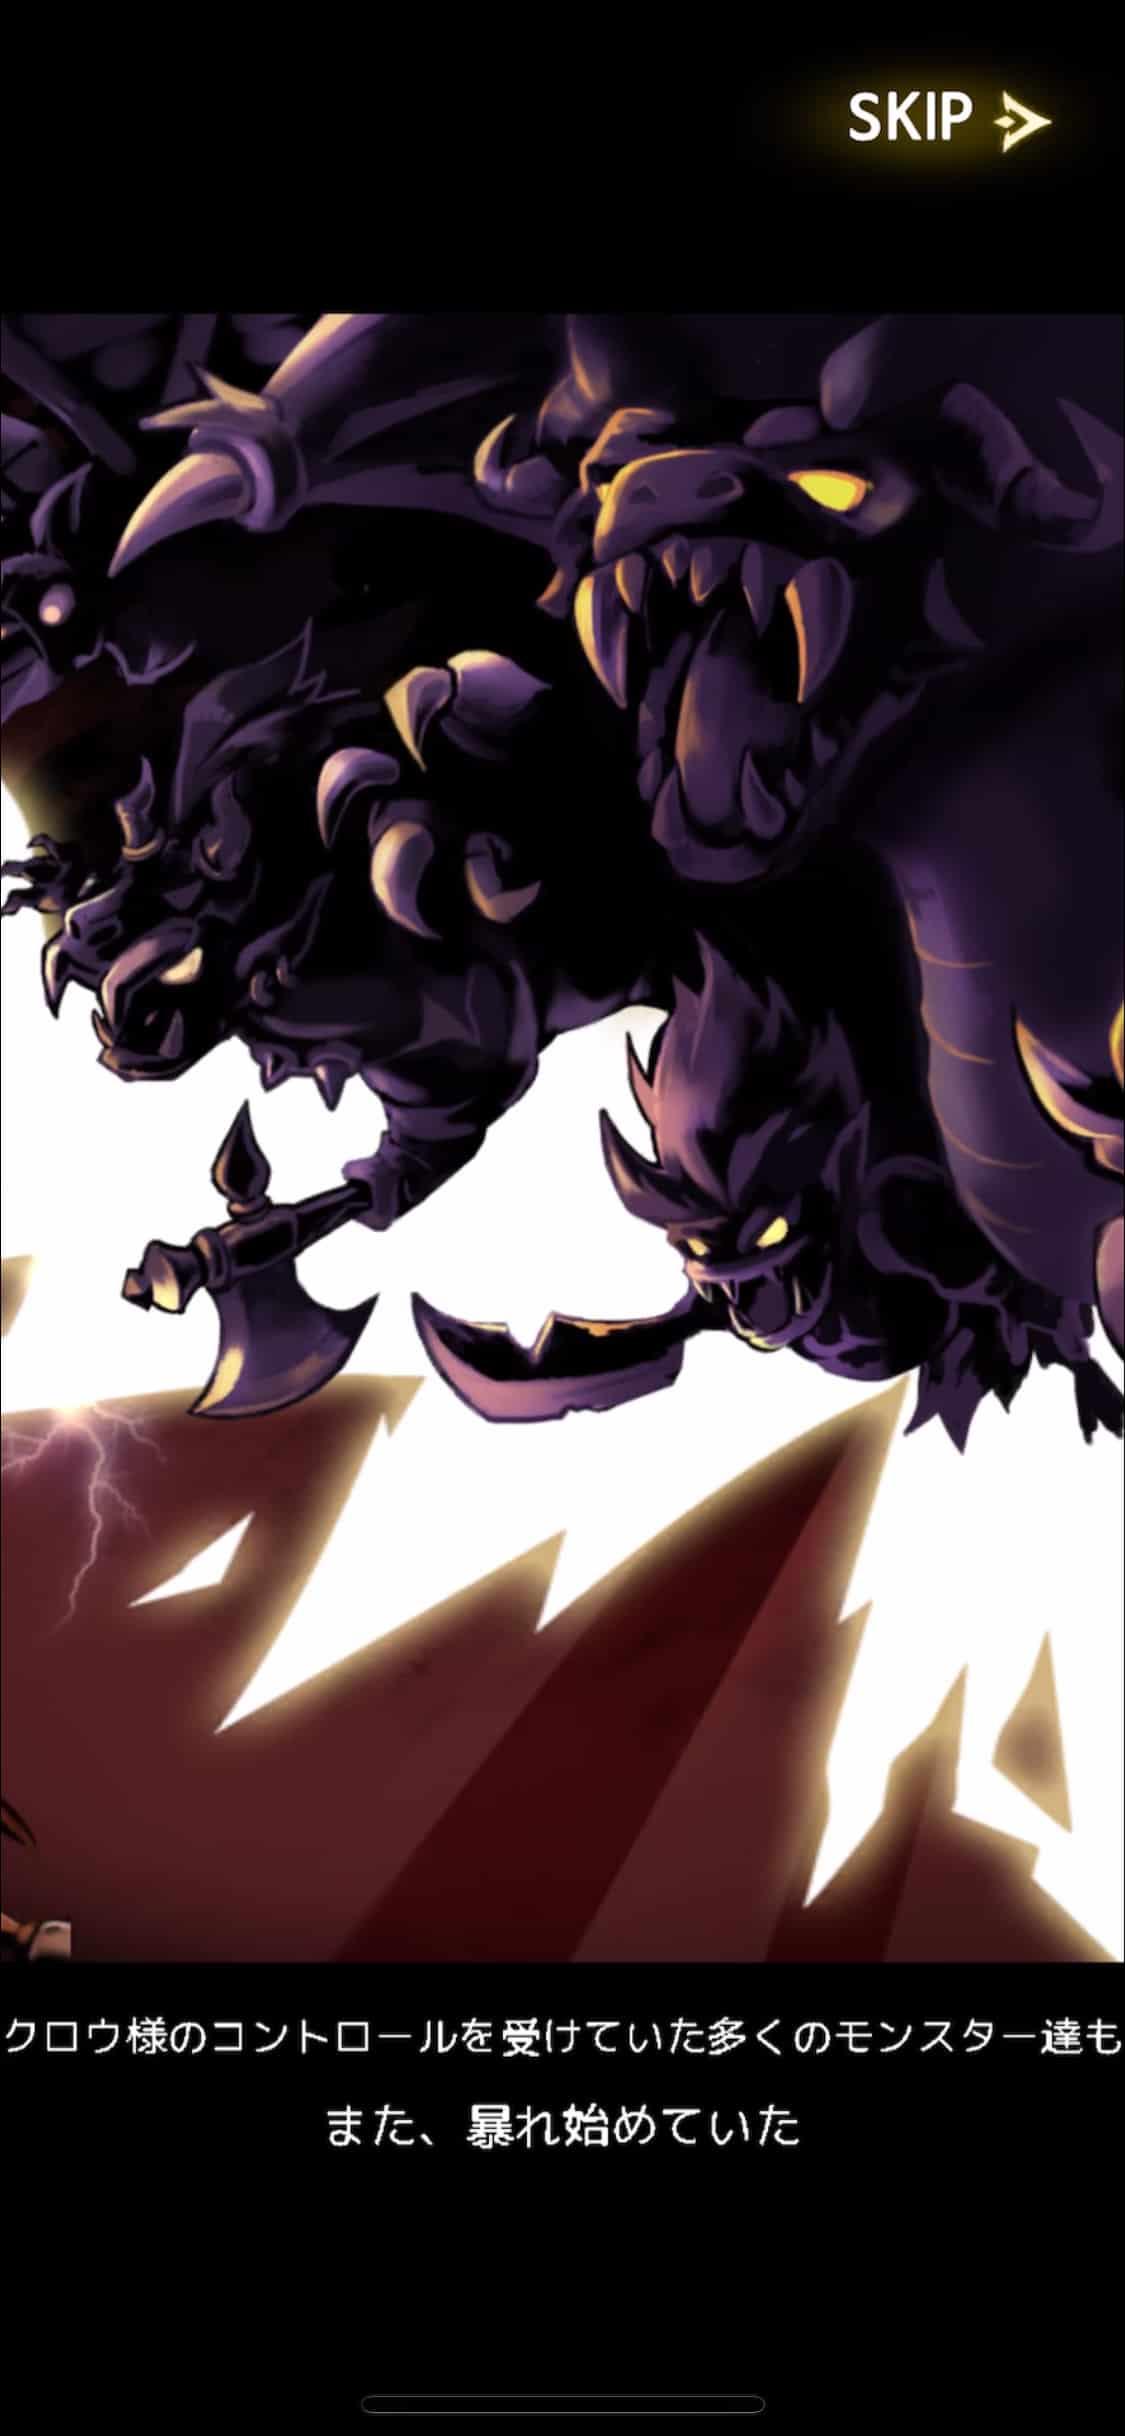 The Skull2: 魔界大乱闘のレビューまとめ